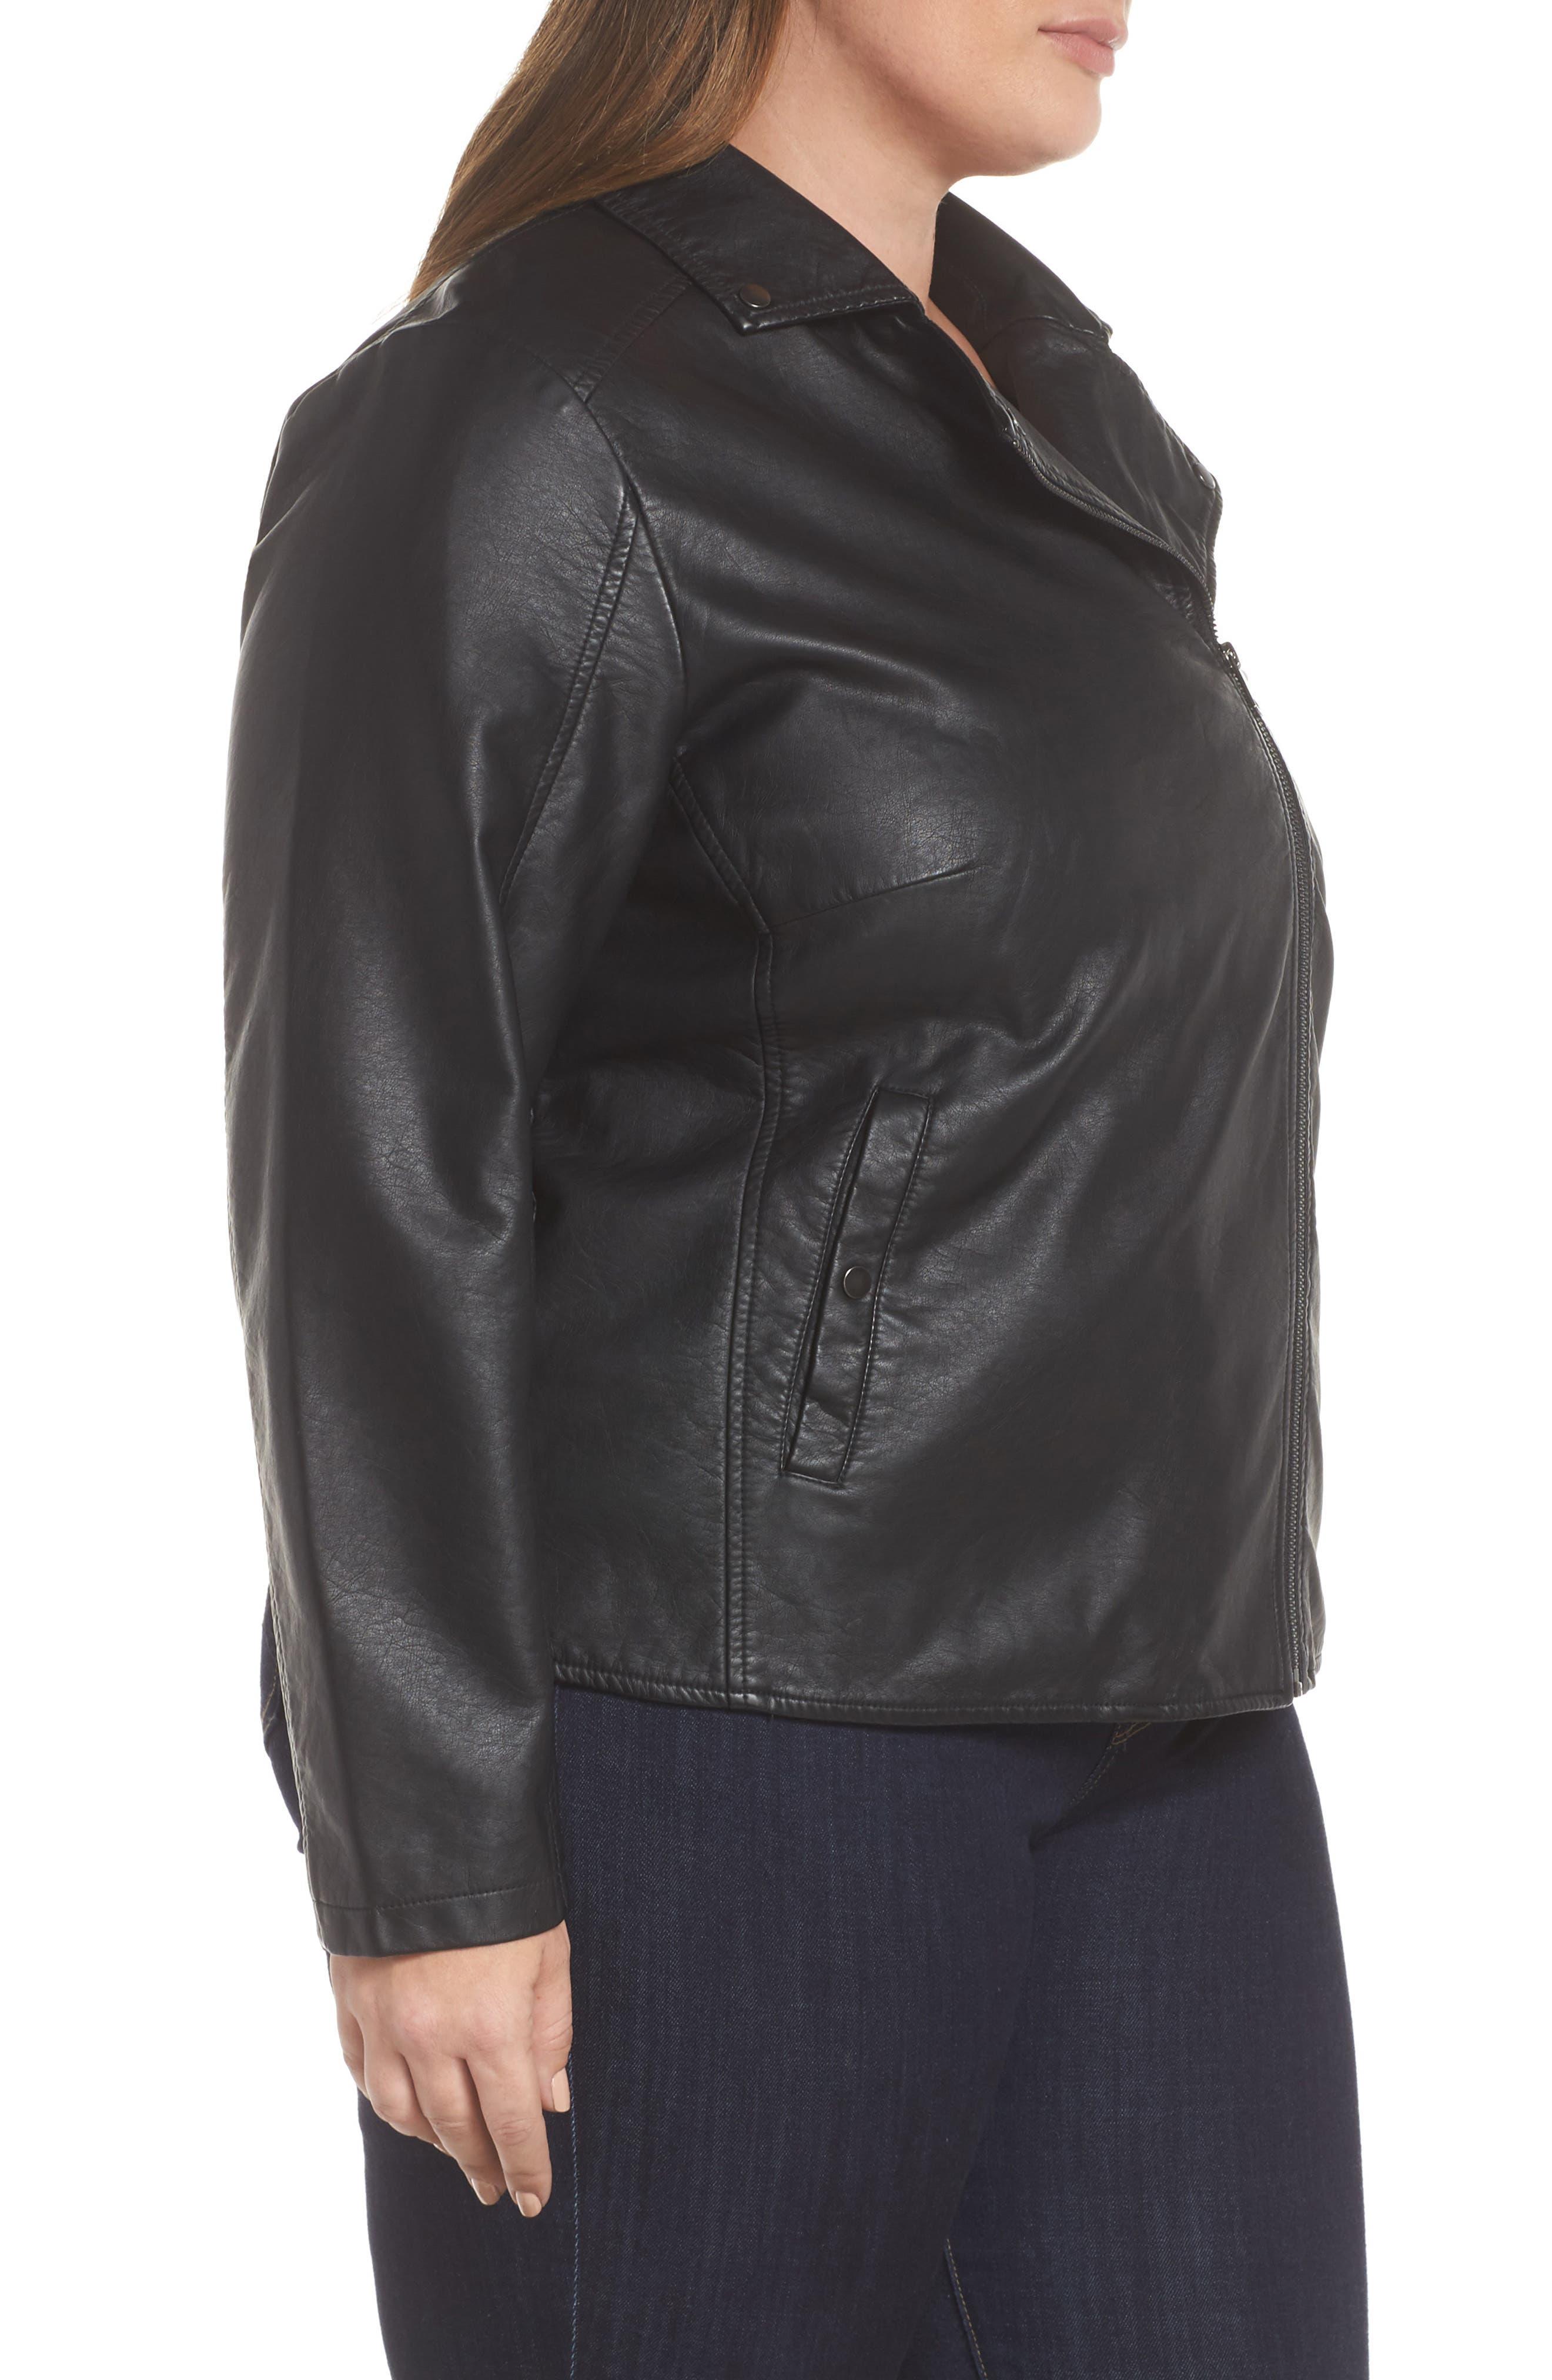 Karisa Faux Leather Moto Jacket,                             Alternate thumbnail 3, color,                             002